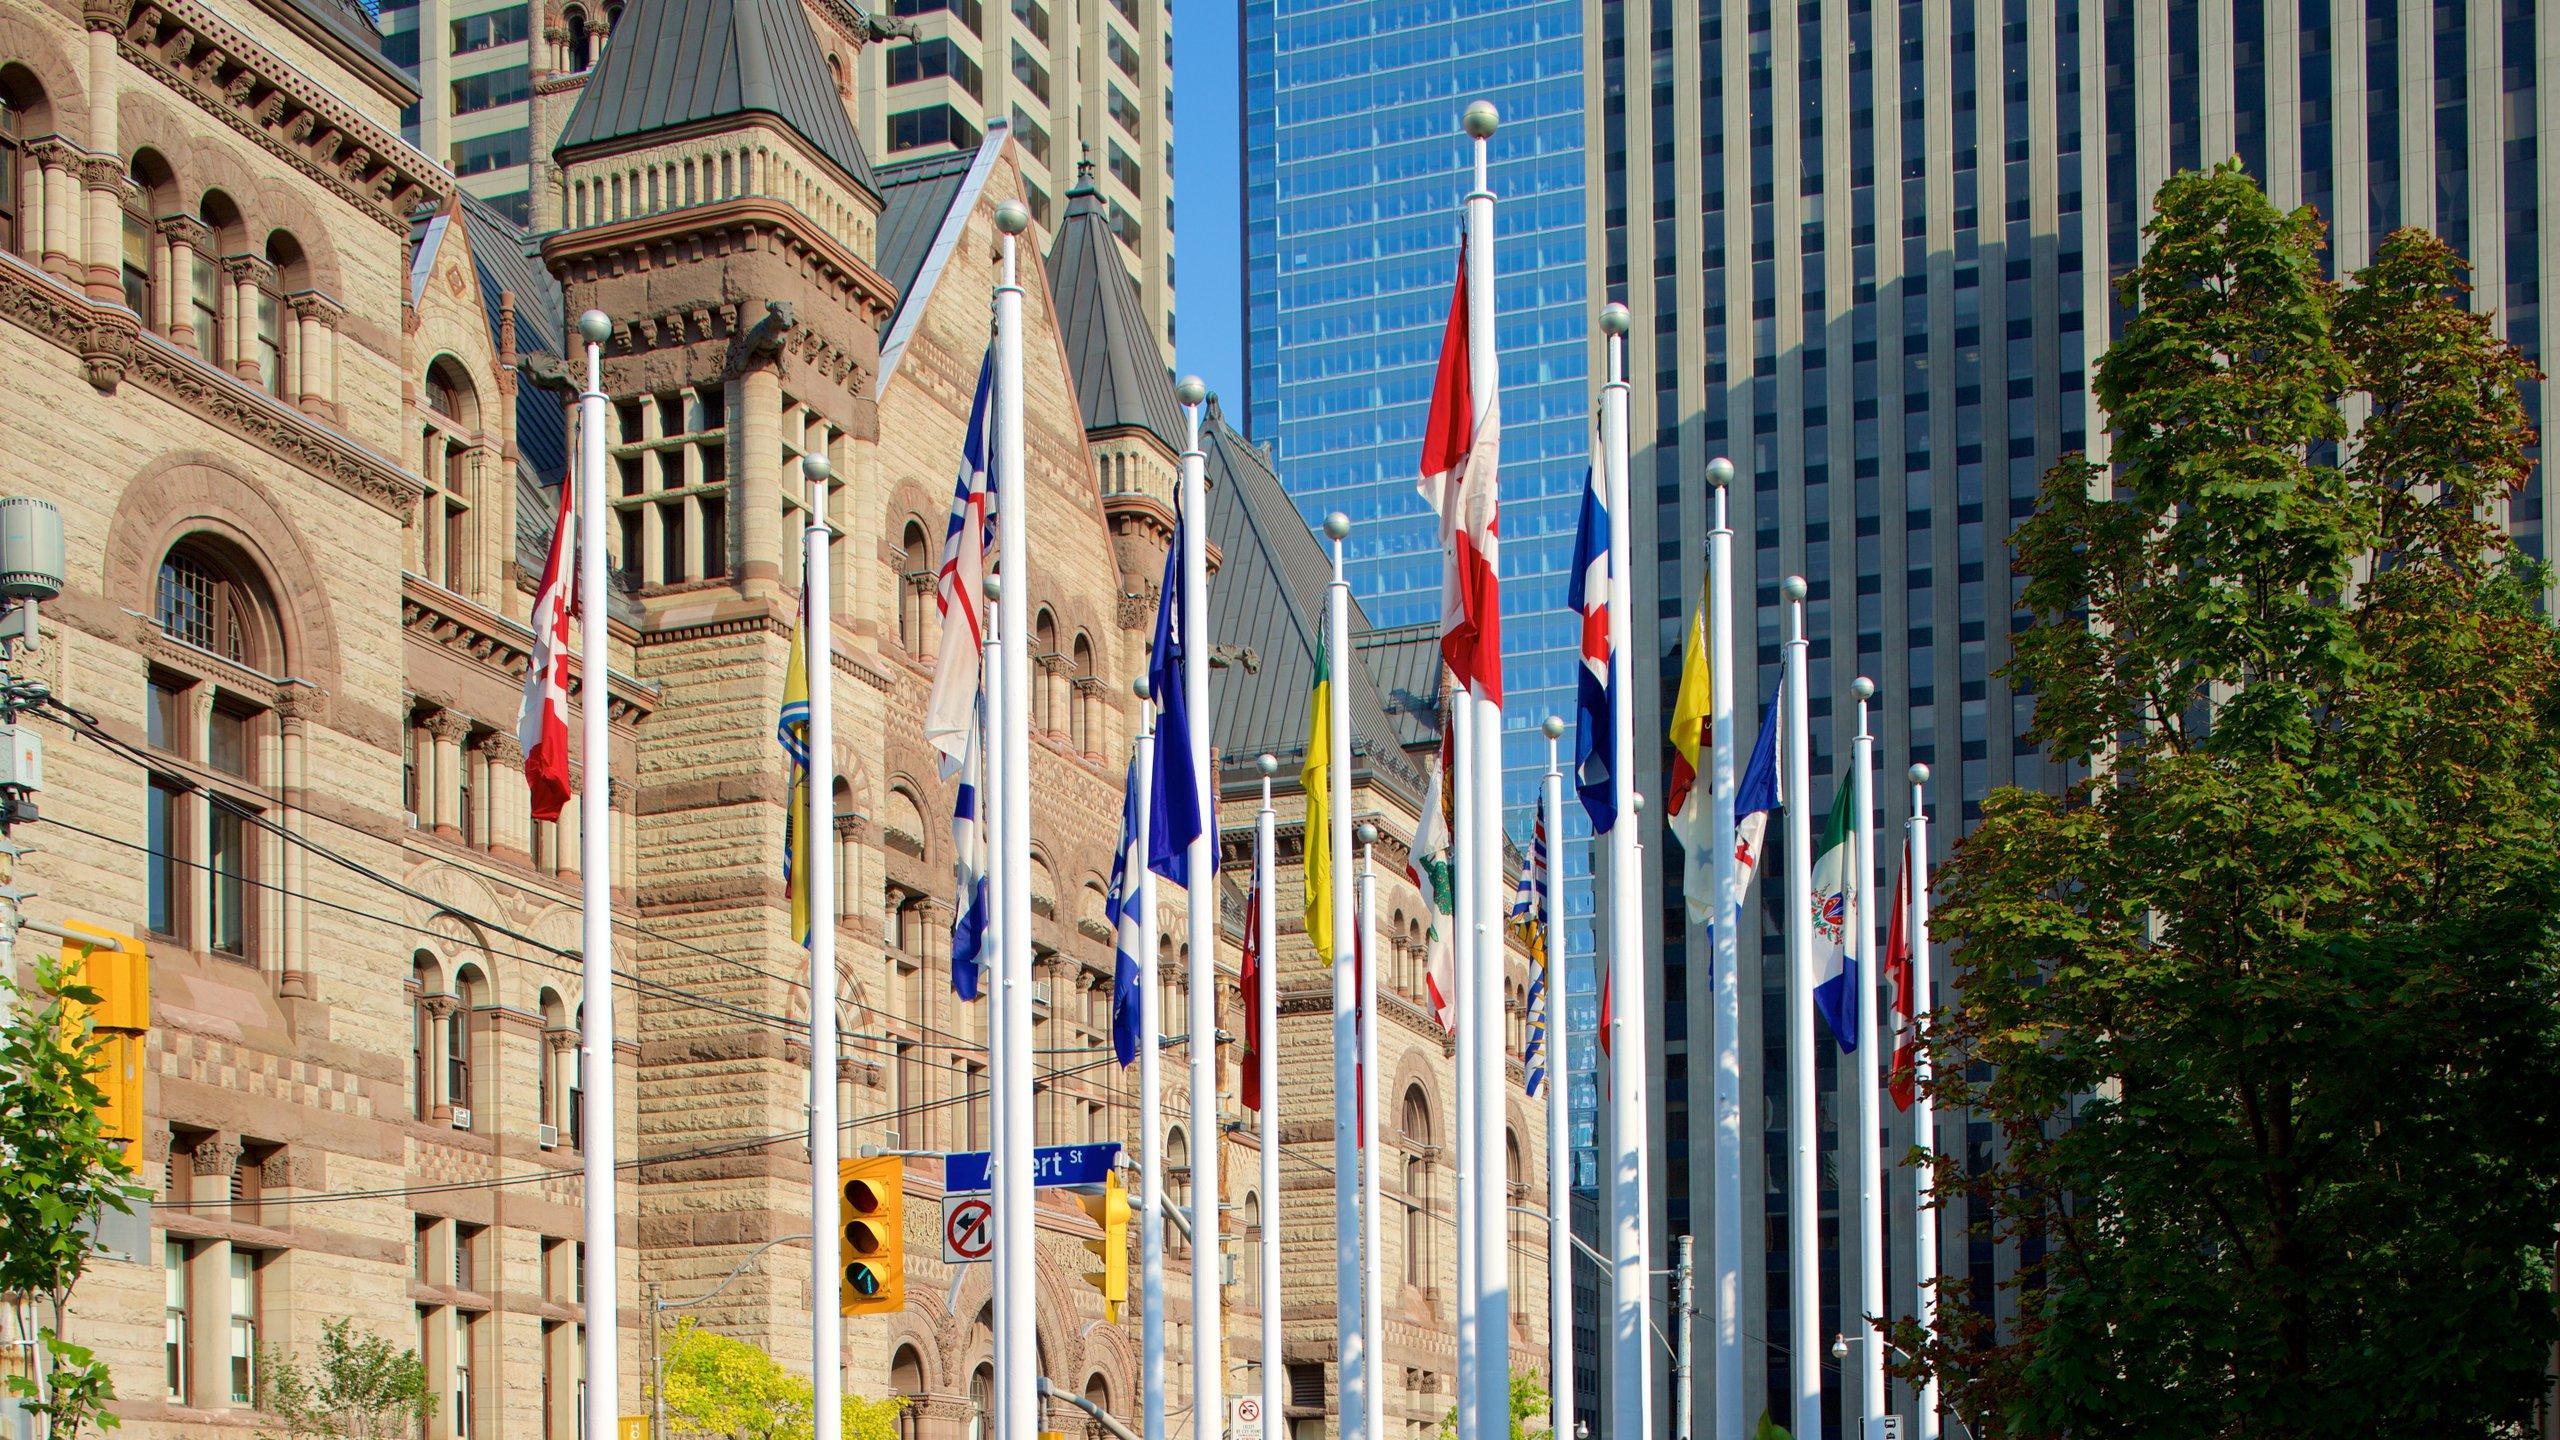 Downtown Toronto, Toronto, Ontario, Canada